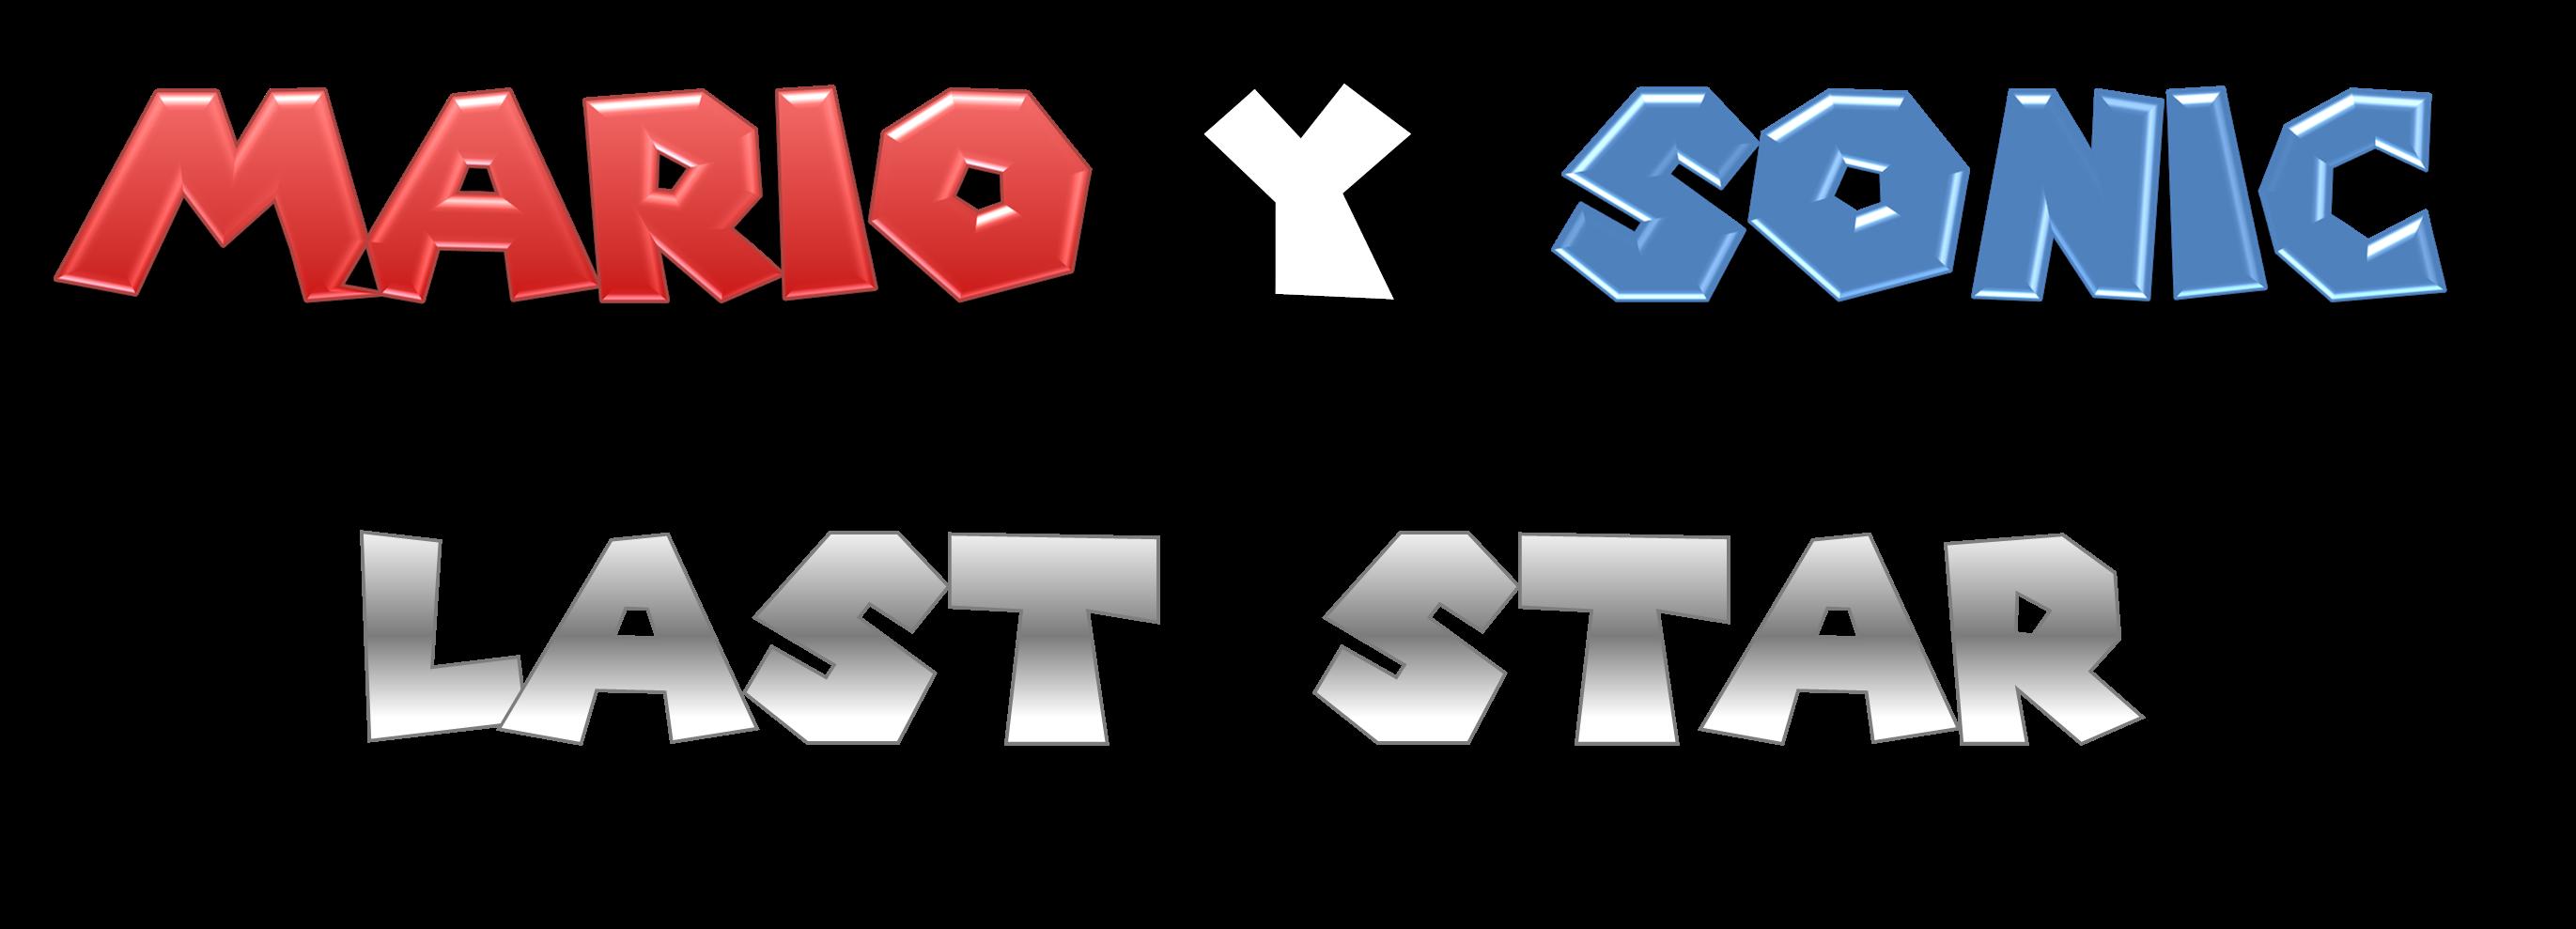 Mario & Sonic Last Star